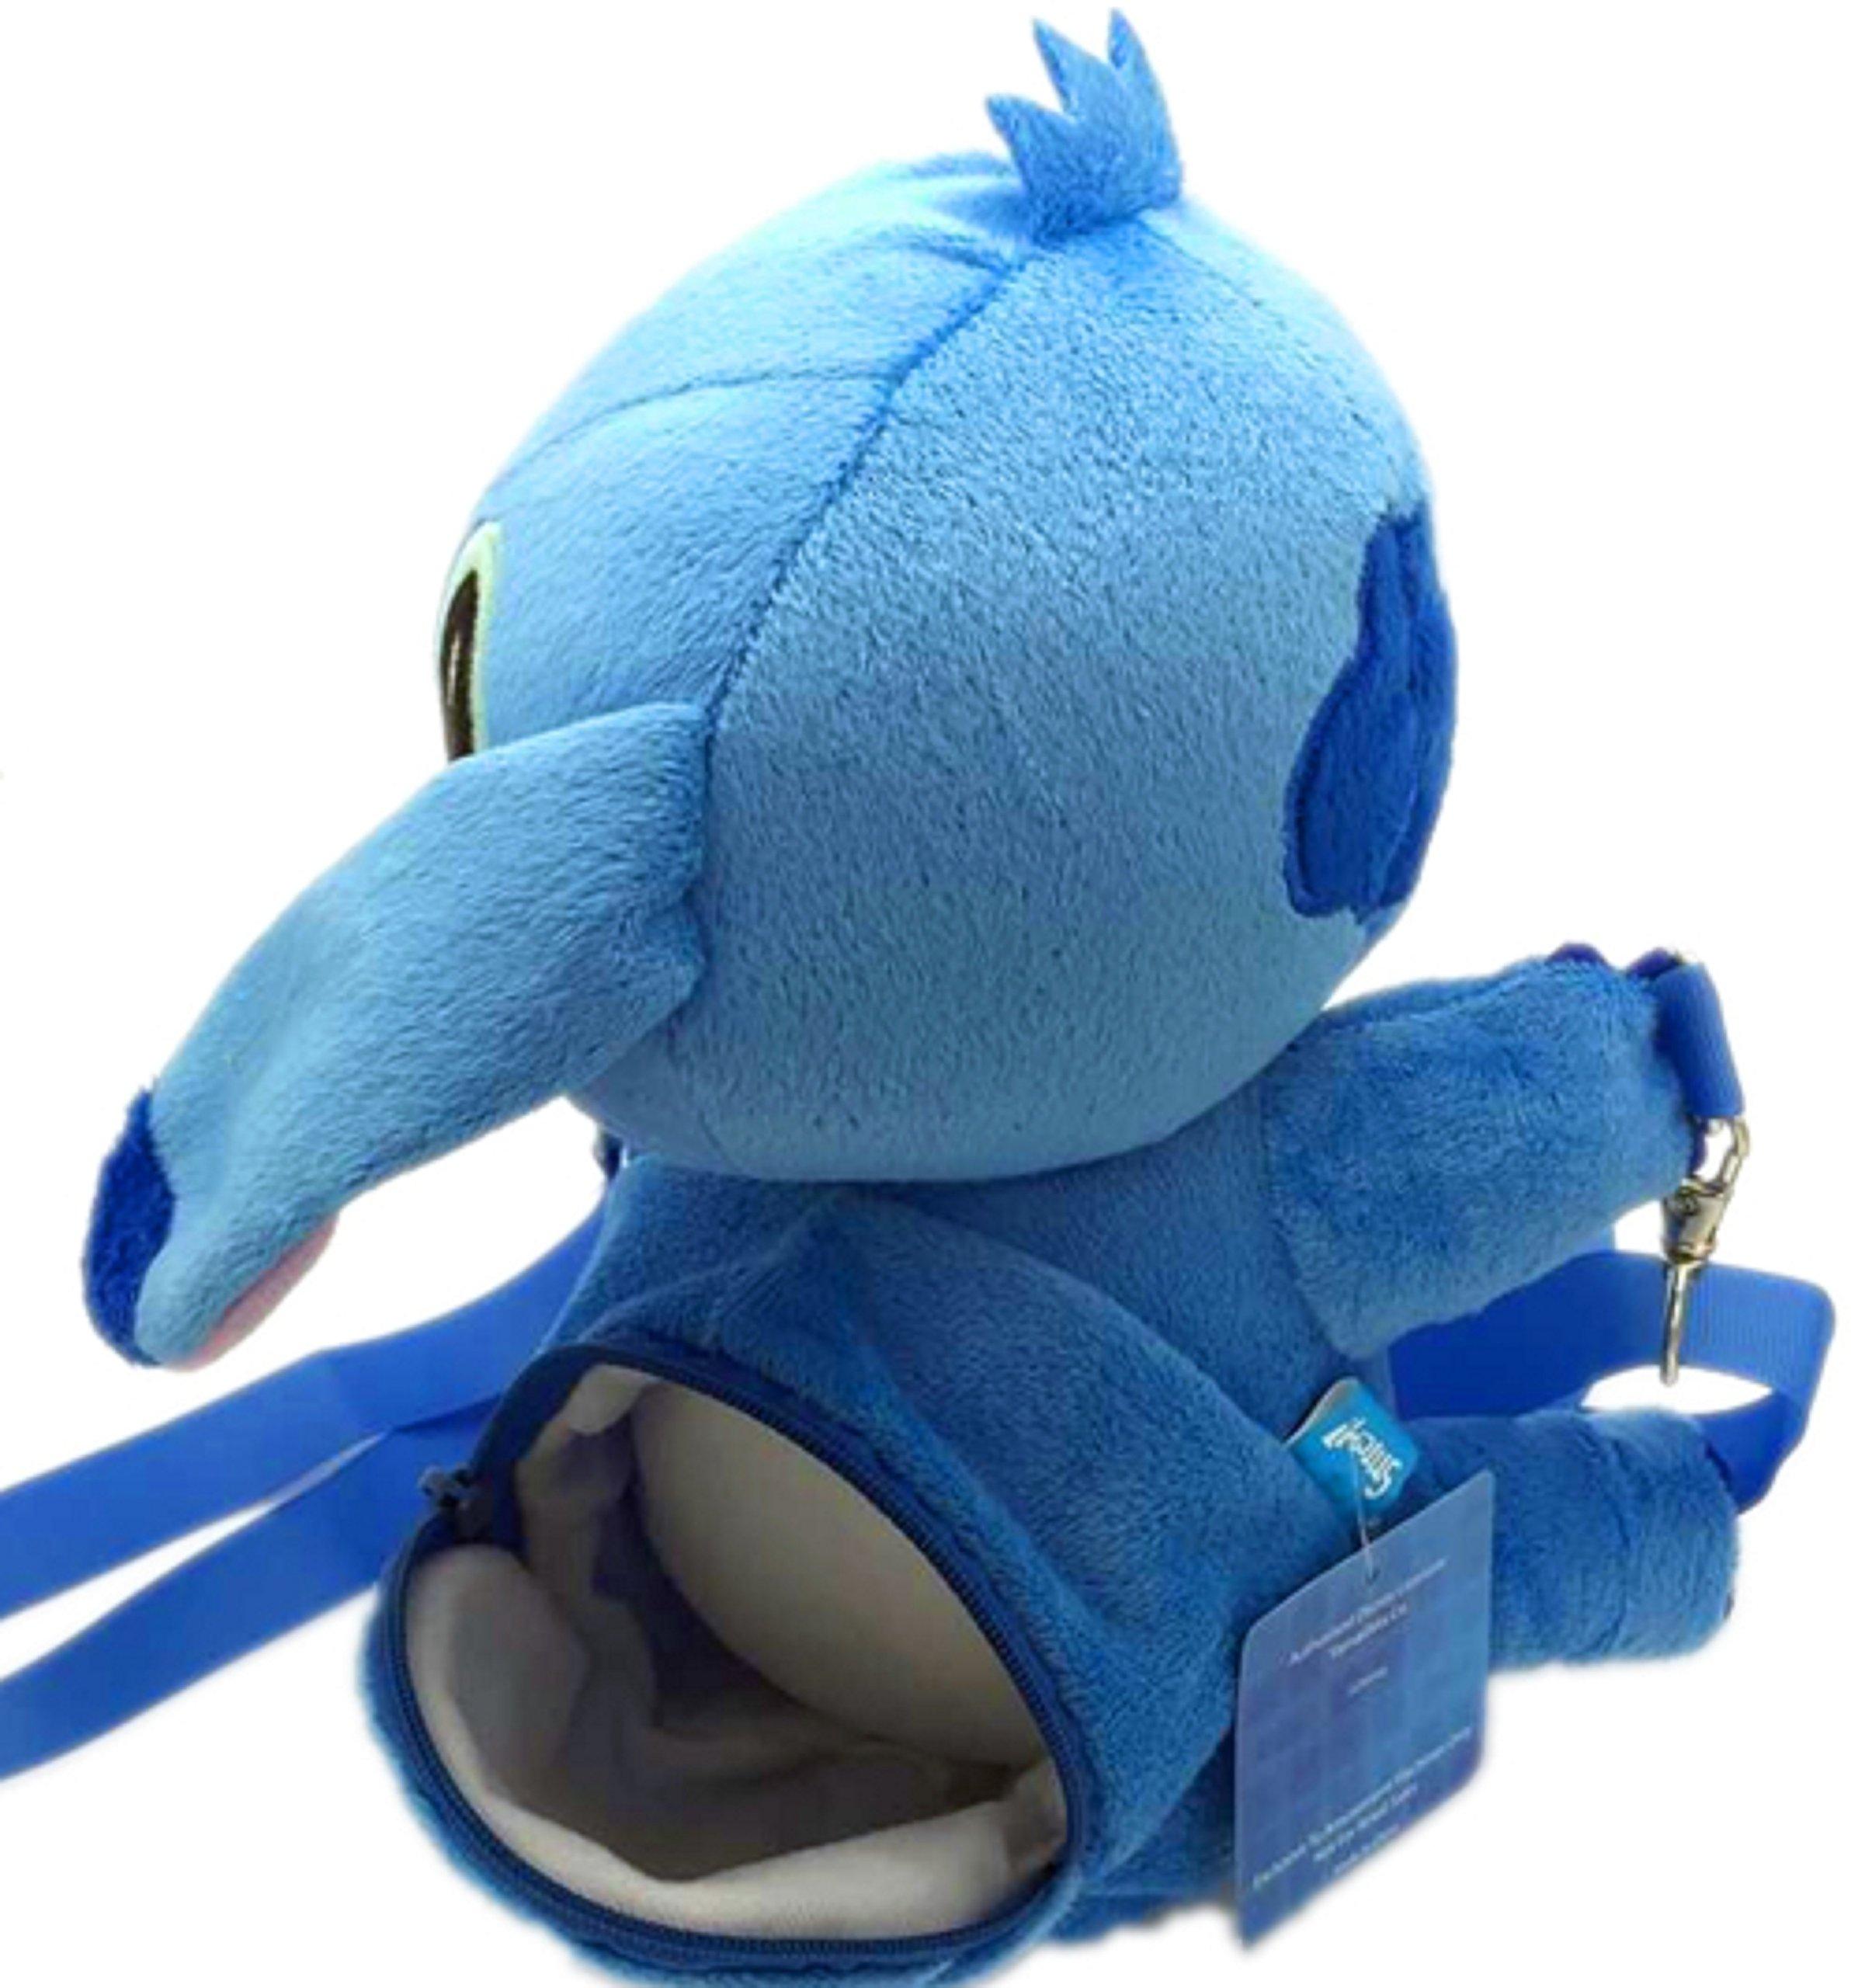 Disney Stitch Set . Soft Plush Crossbody/Shoulder Mini Bag with Small Pocket + Stitch Watch For kids. H 9''. Limited Edition. by LILO & STITCH (Image #5)